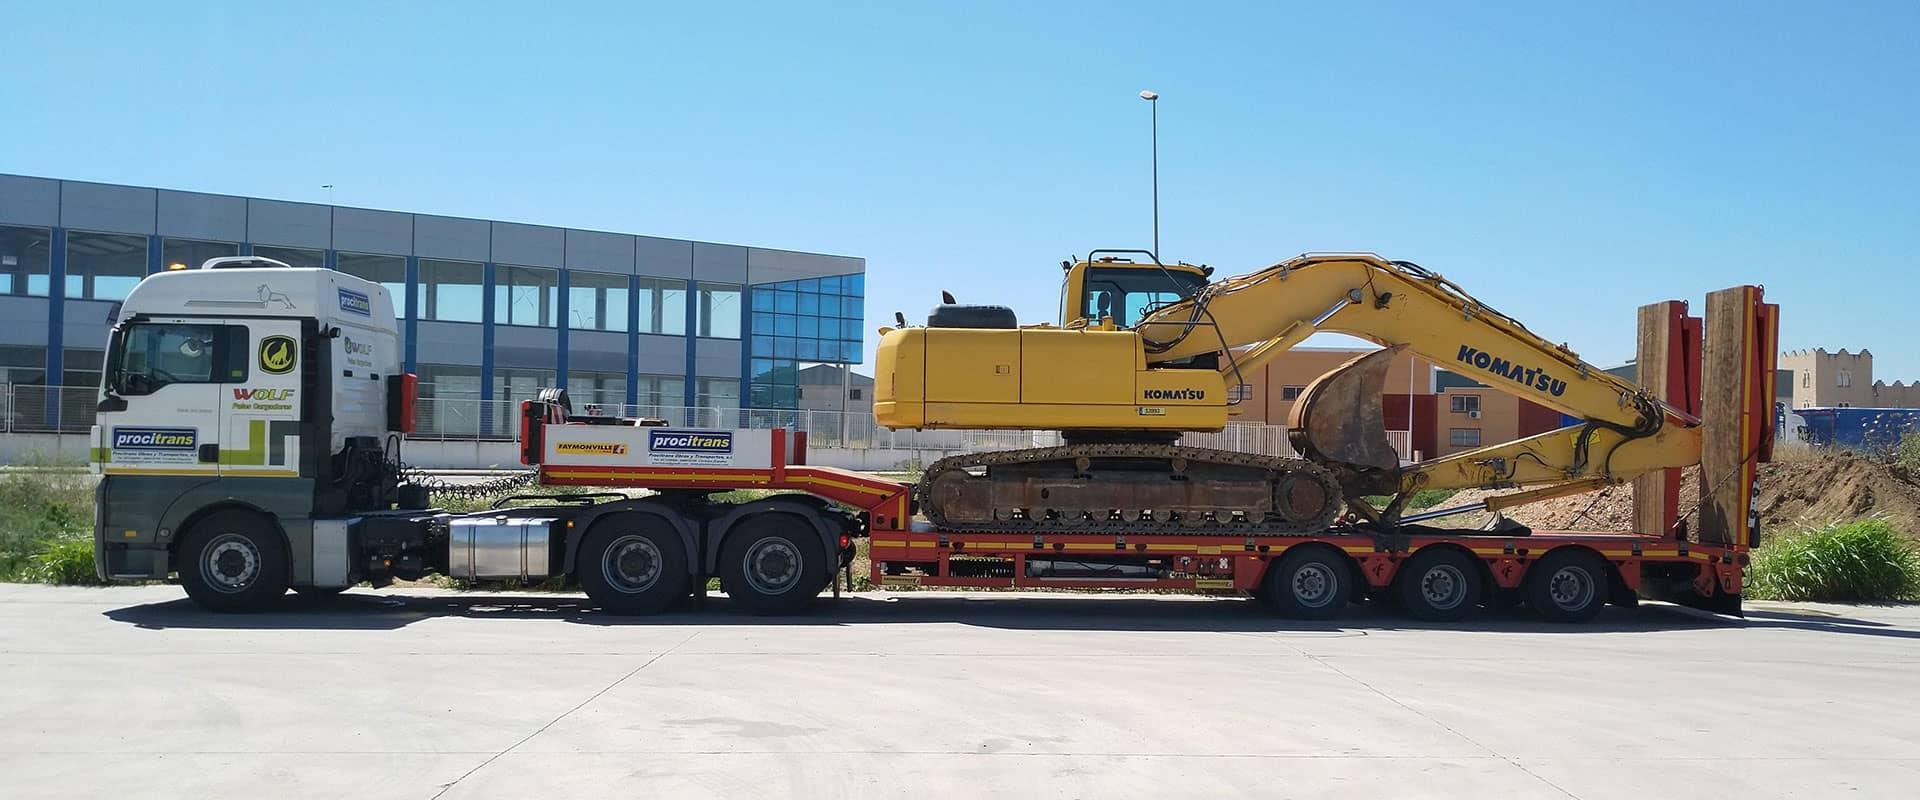 heavy equipment transport Procitrans 2